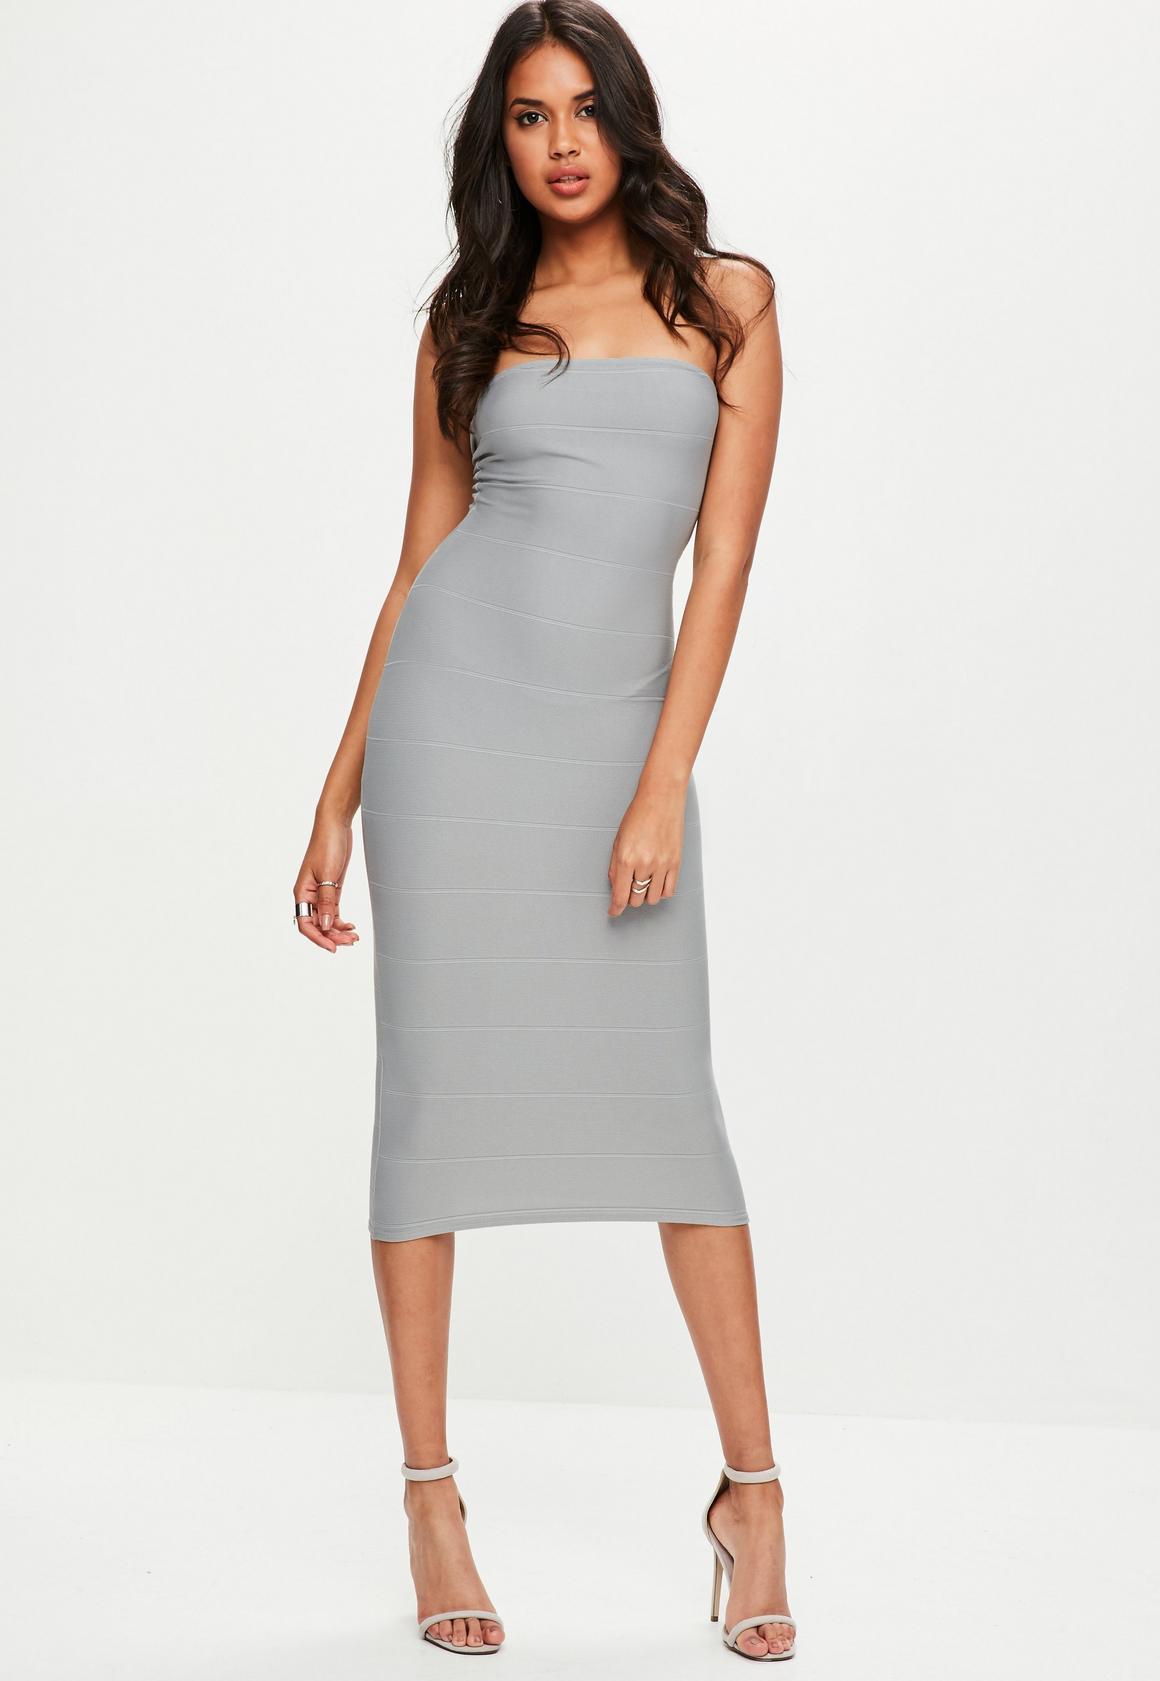 Grey Strapless Bandage Midi Dress | Missguided